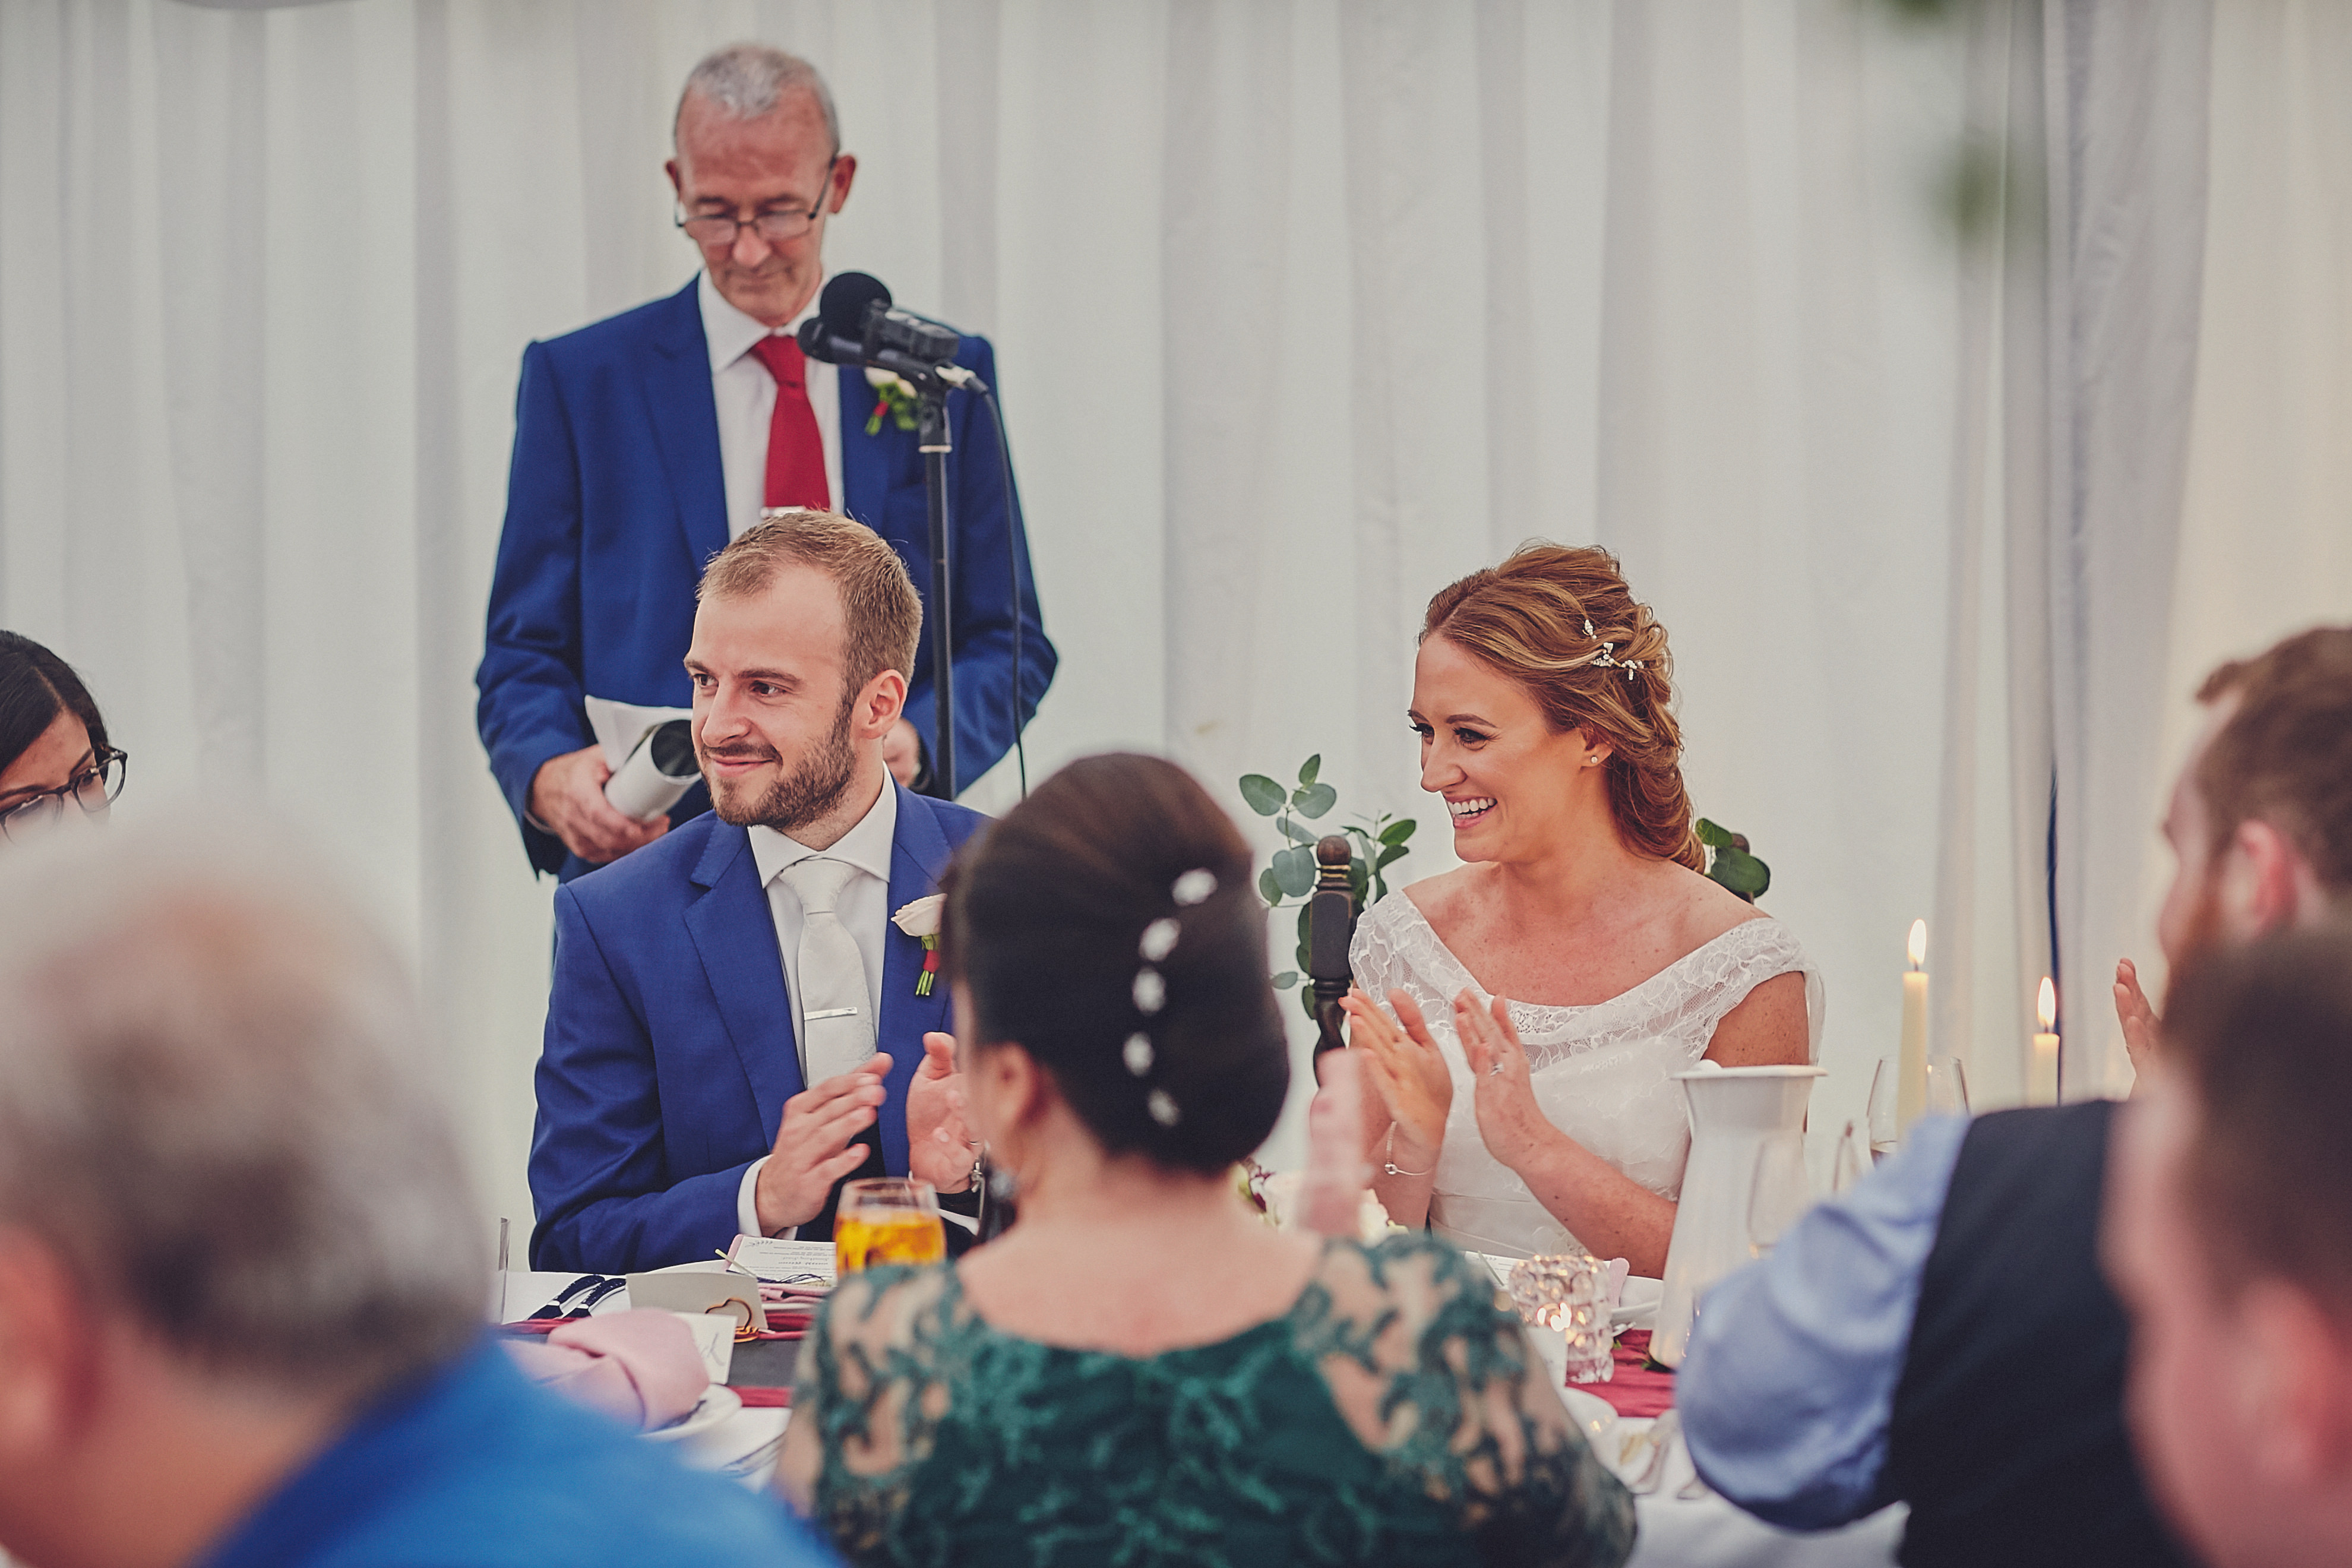 Cloughjordan House weddding132 - Cloughjordan House Wedding - Alternative Venue